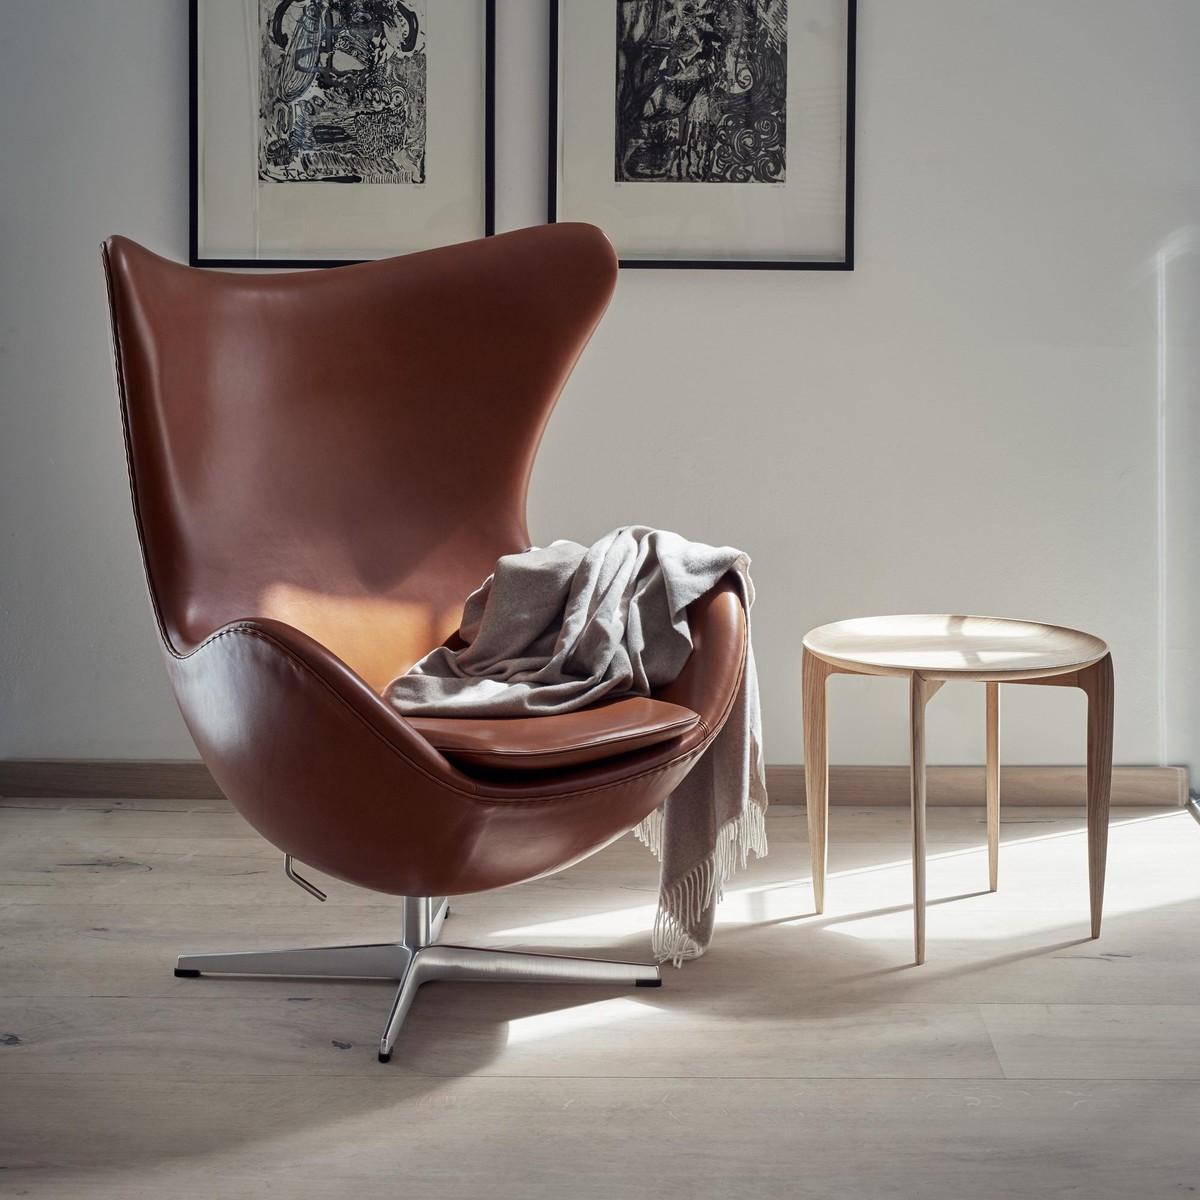 sessel ei preis williamflooring. Black Bedroom Furniture Sets. Home Design Ideas